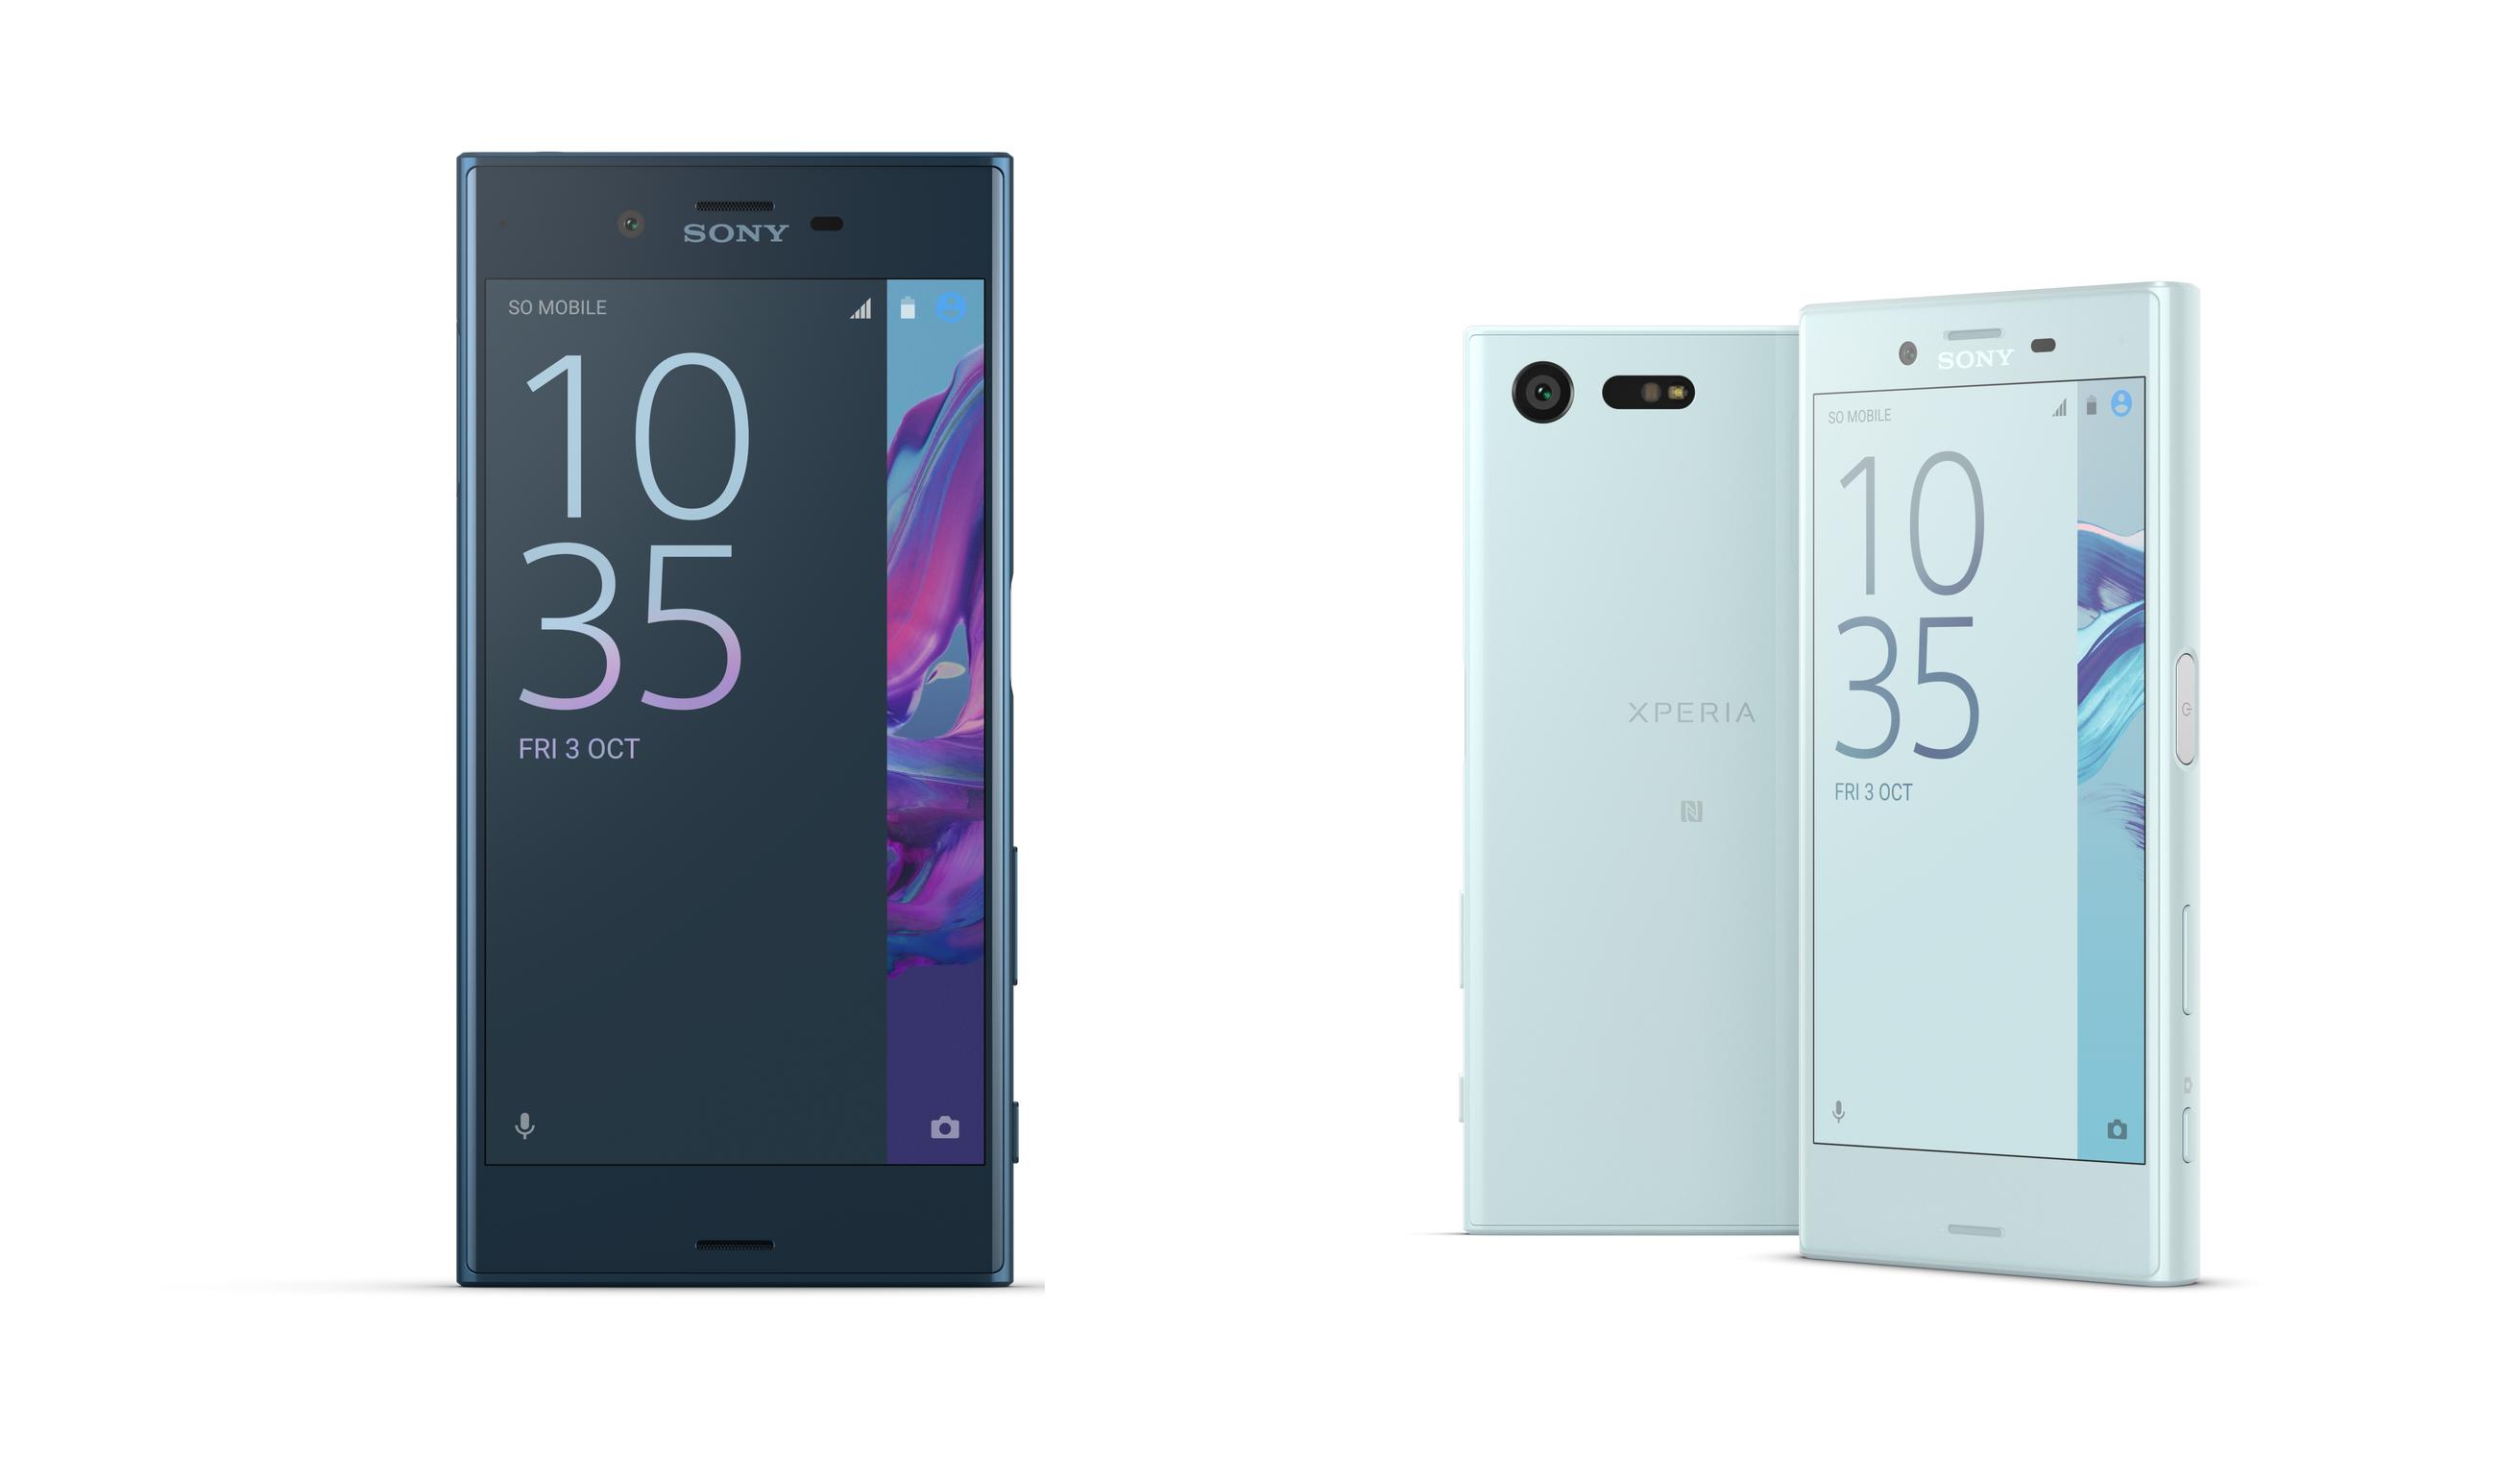 lowest price 0ce13 7d5fb 9to5Toys Lunch Break: Samsung Galaxy S7 (unlocked, refurb) $370 ...